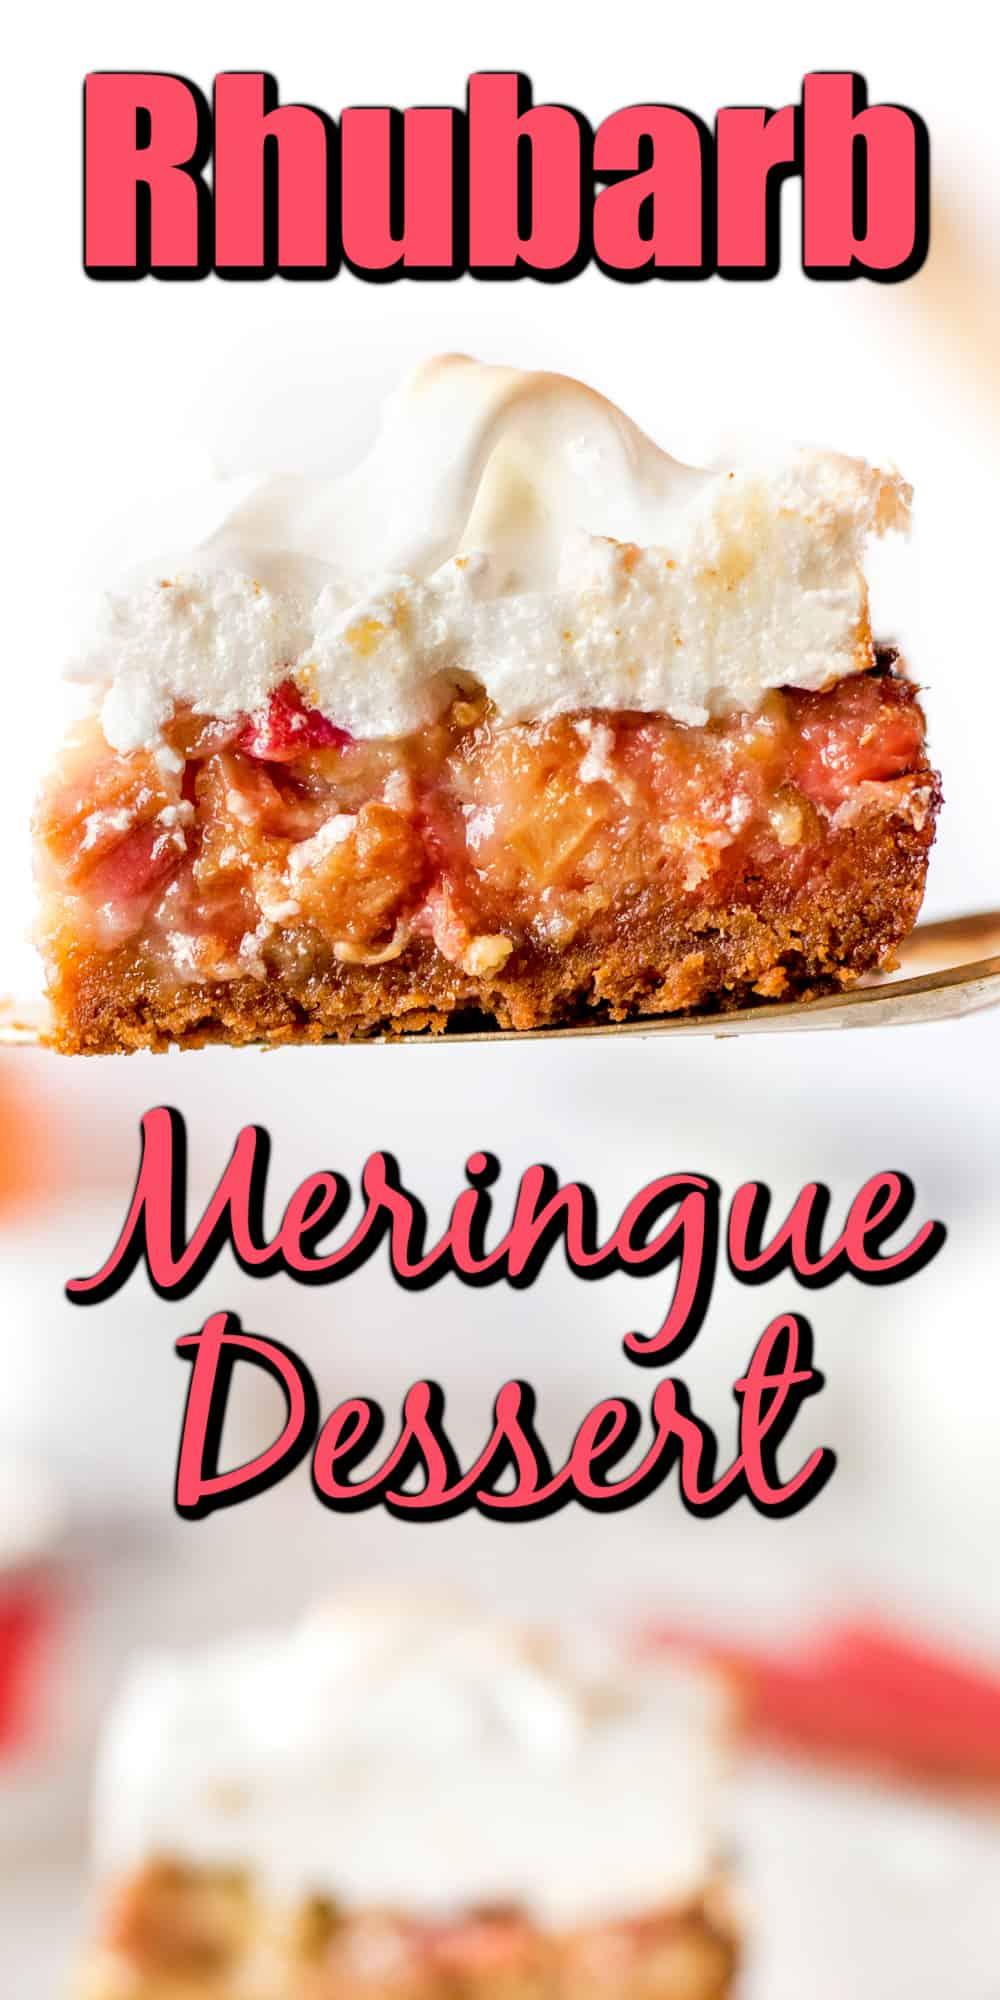 Rhubarb Meringue Dessert Pin